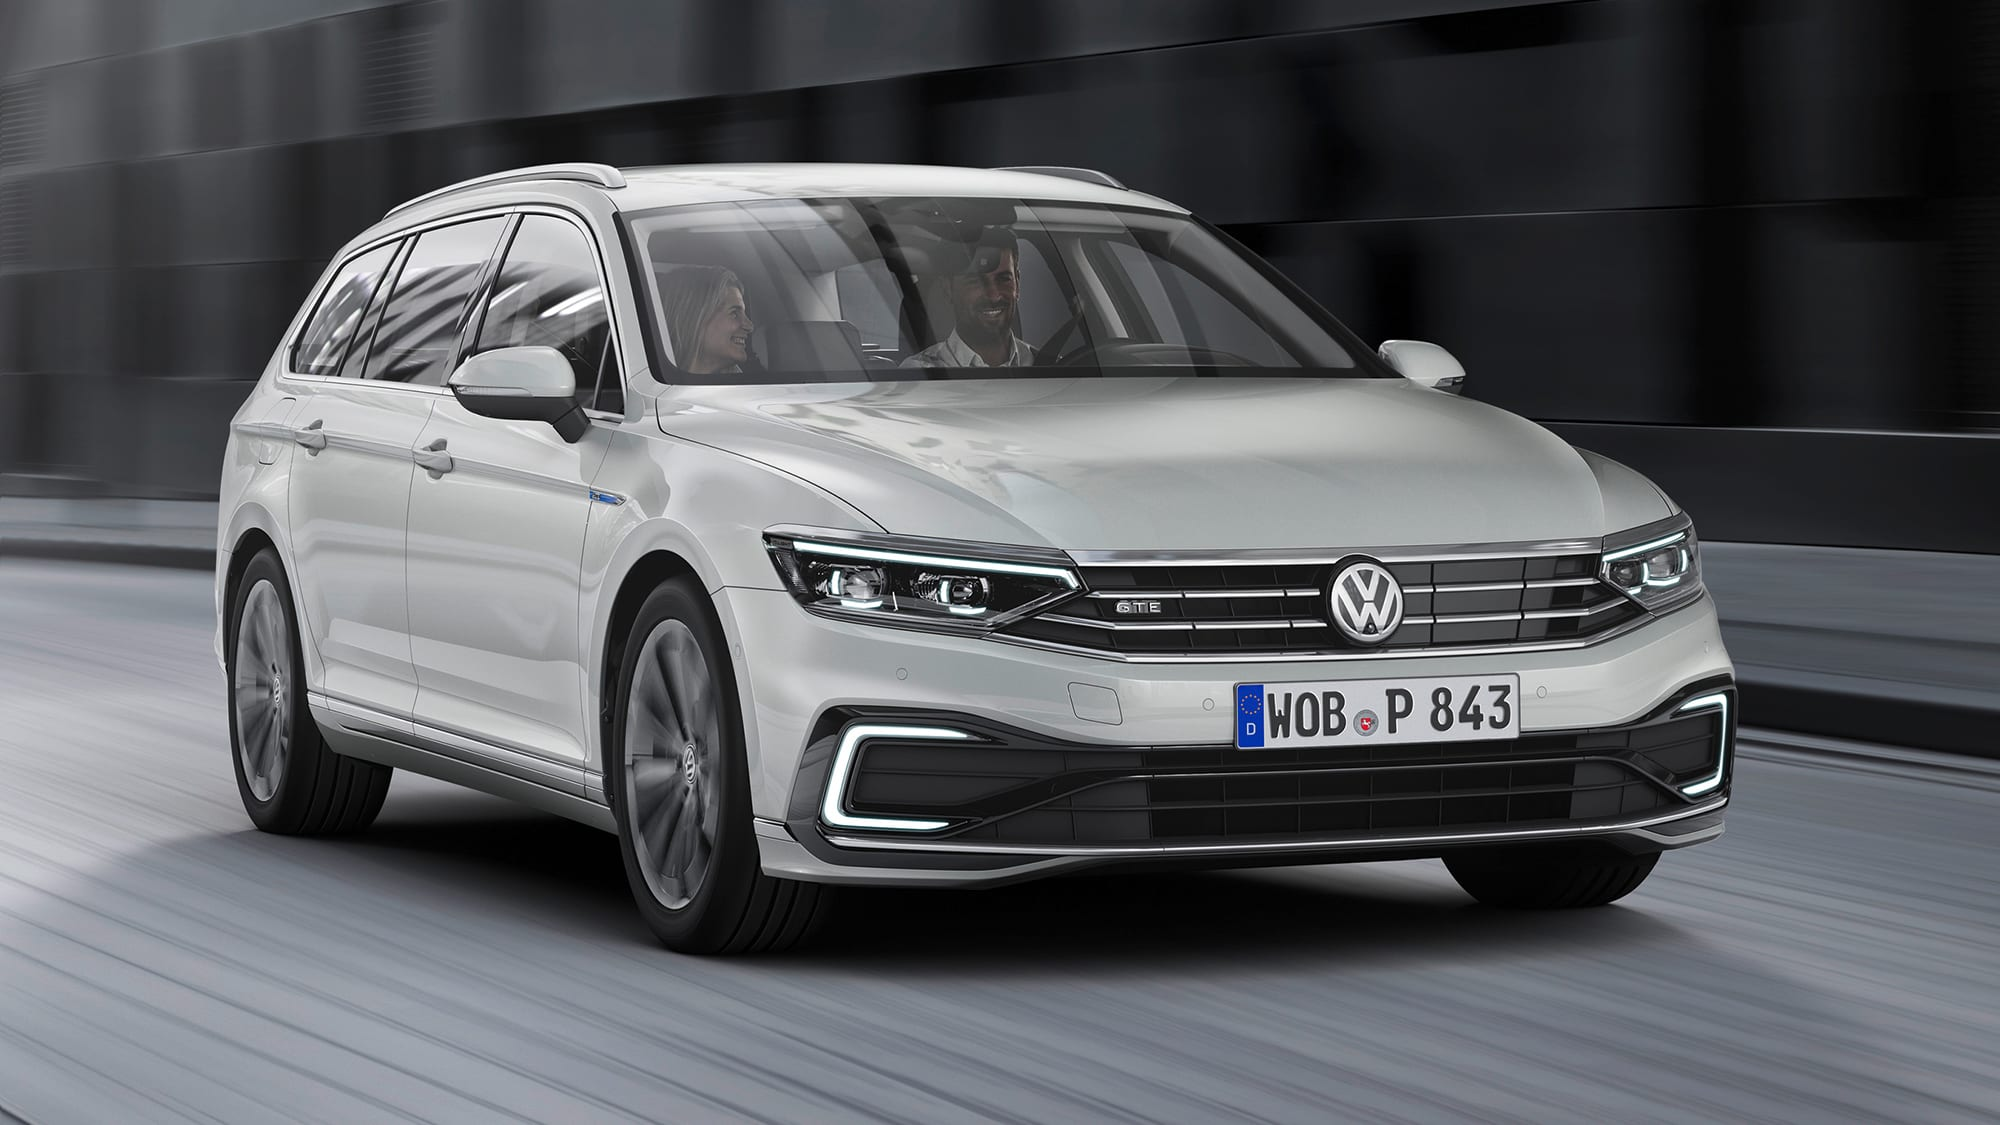 2020 Volkswagen GTE Estate DB2019AU00134 large